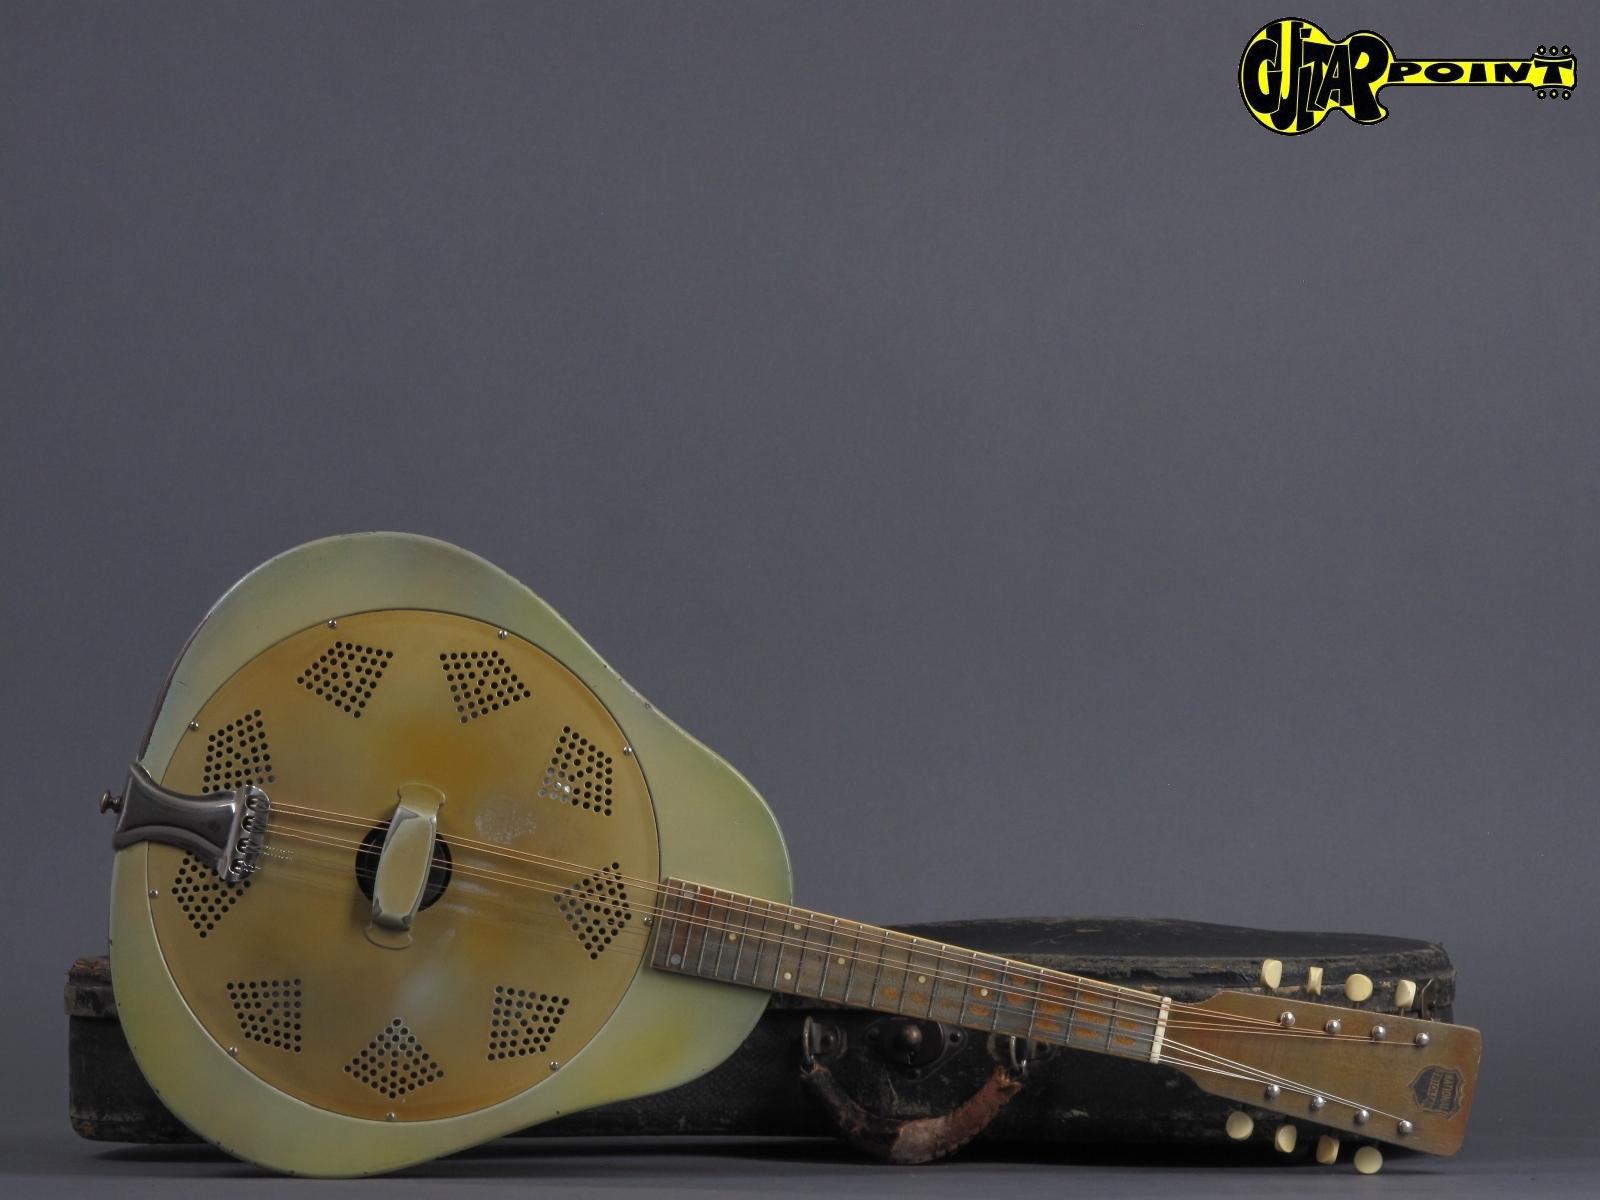 https://guitarpoint.de/app/uploads/products/1930-national-triolian-resonator-mandolin/National30TrioMando386_20.jpg